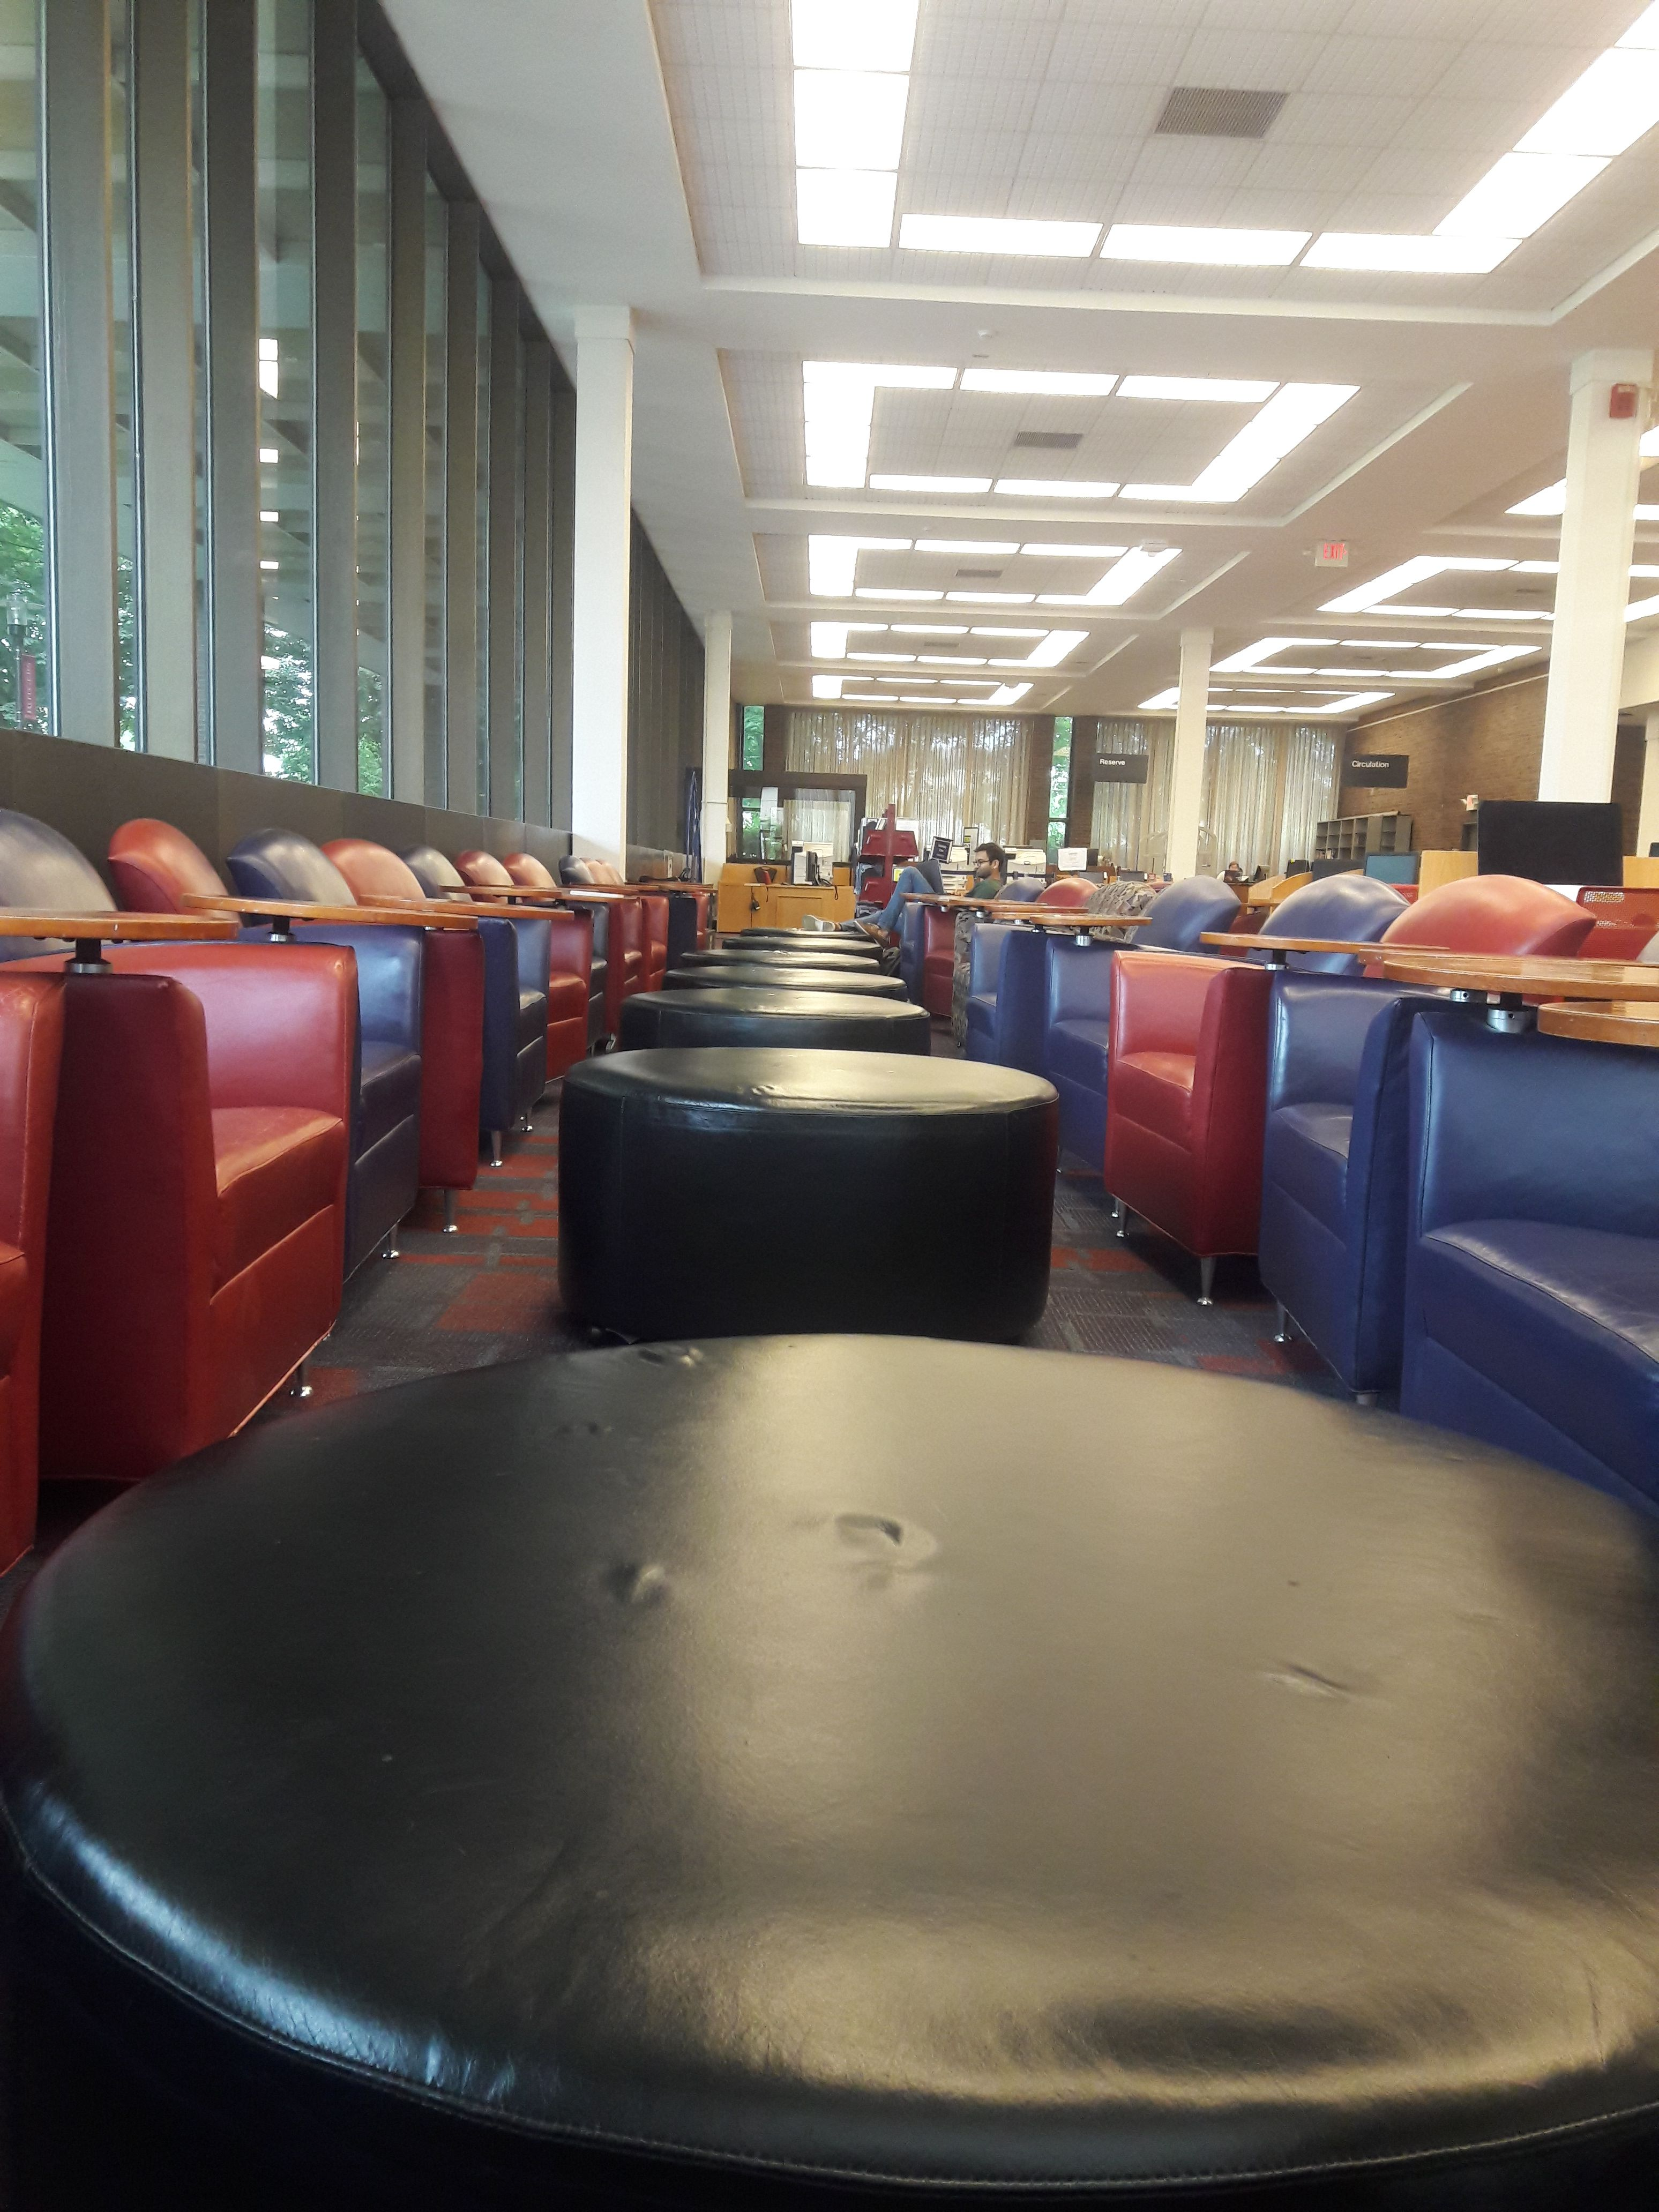 shhh...keep calm and follow!! Carr library, Rutgers